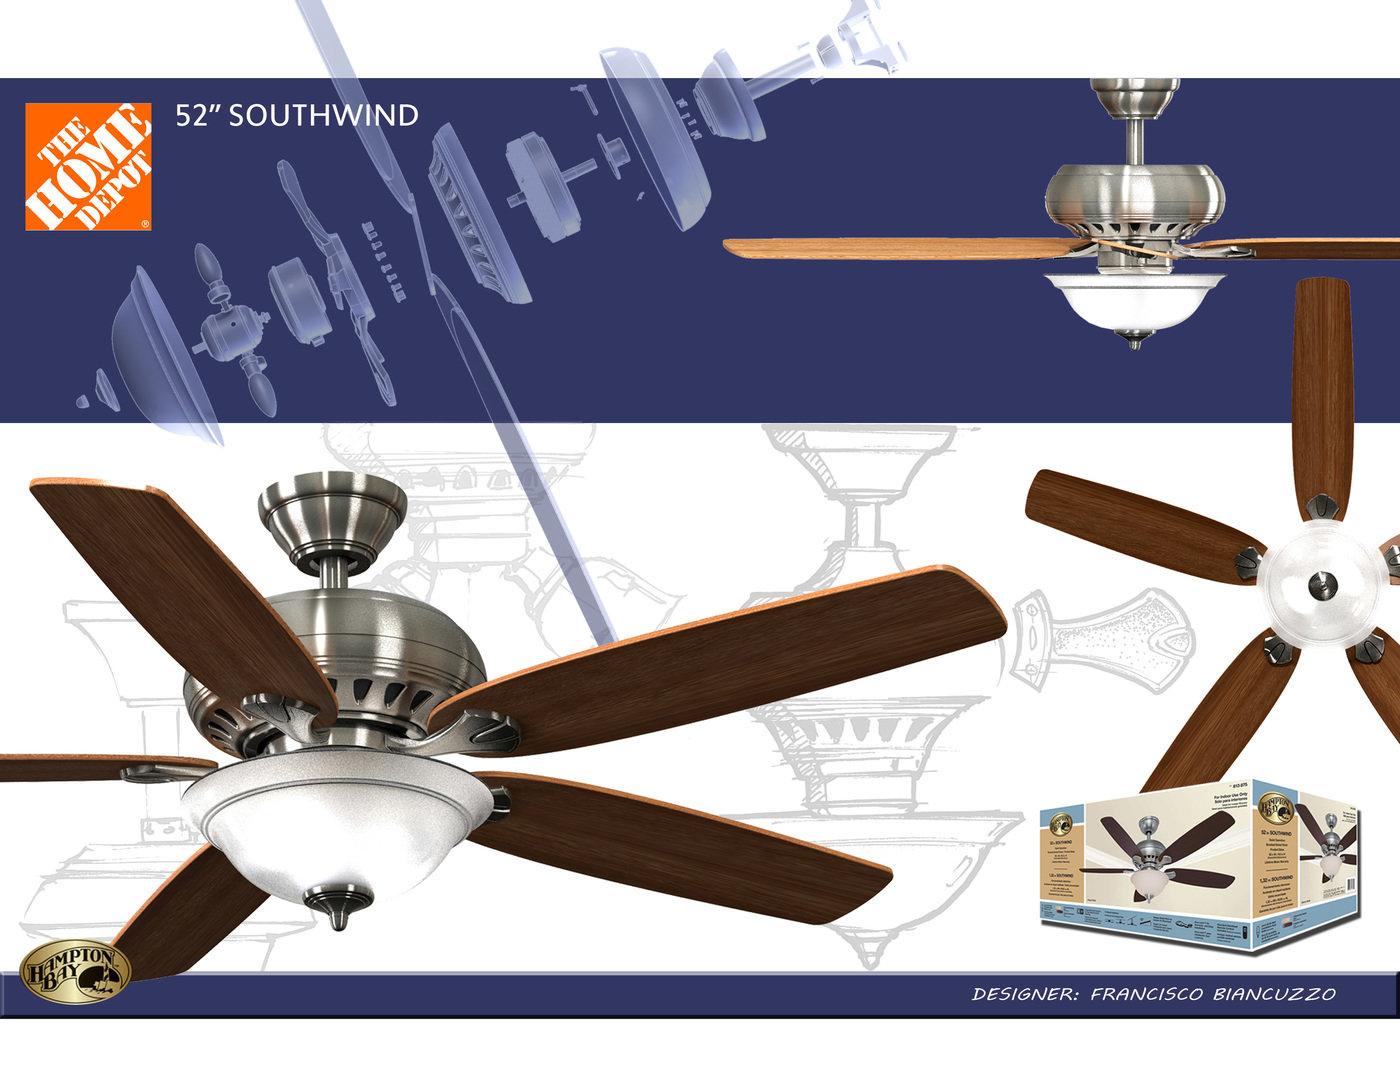 Hampton Bay Southwind Ceiling Fan By Francisco Biancuzzo